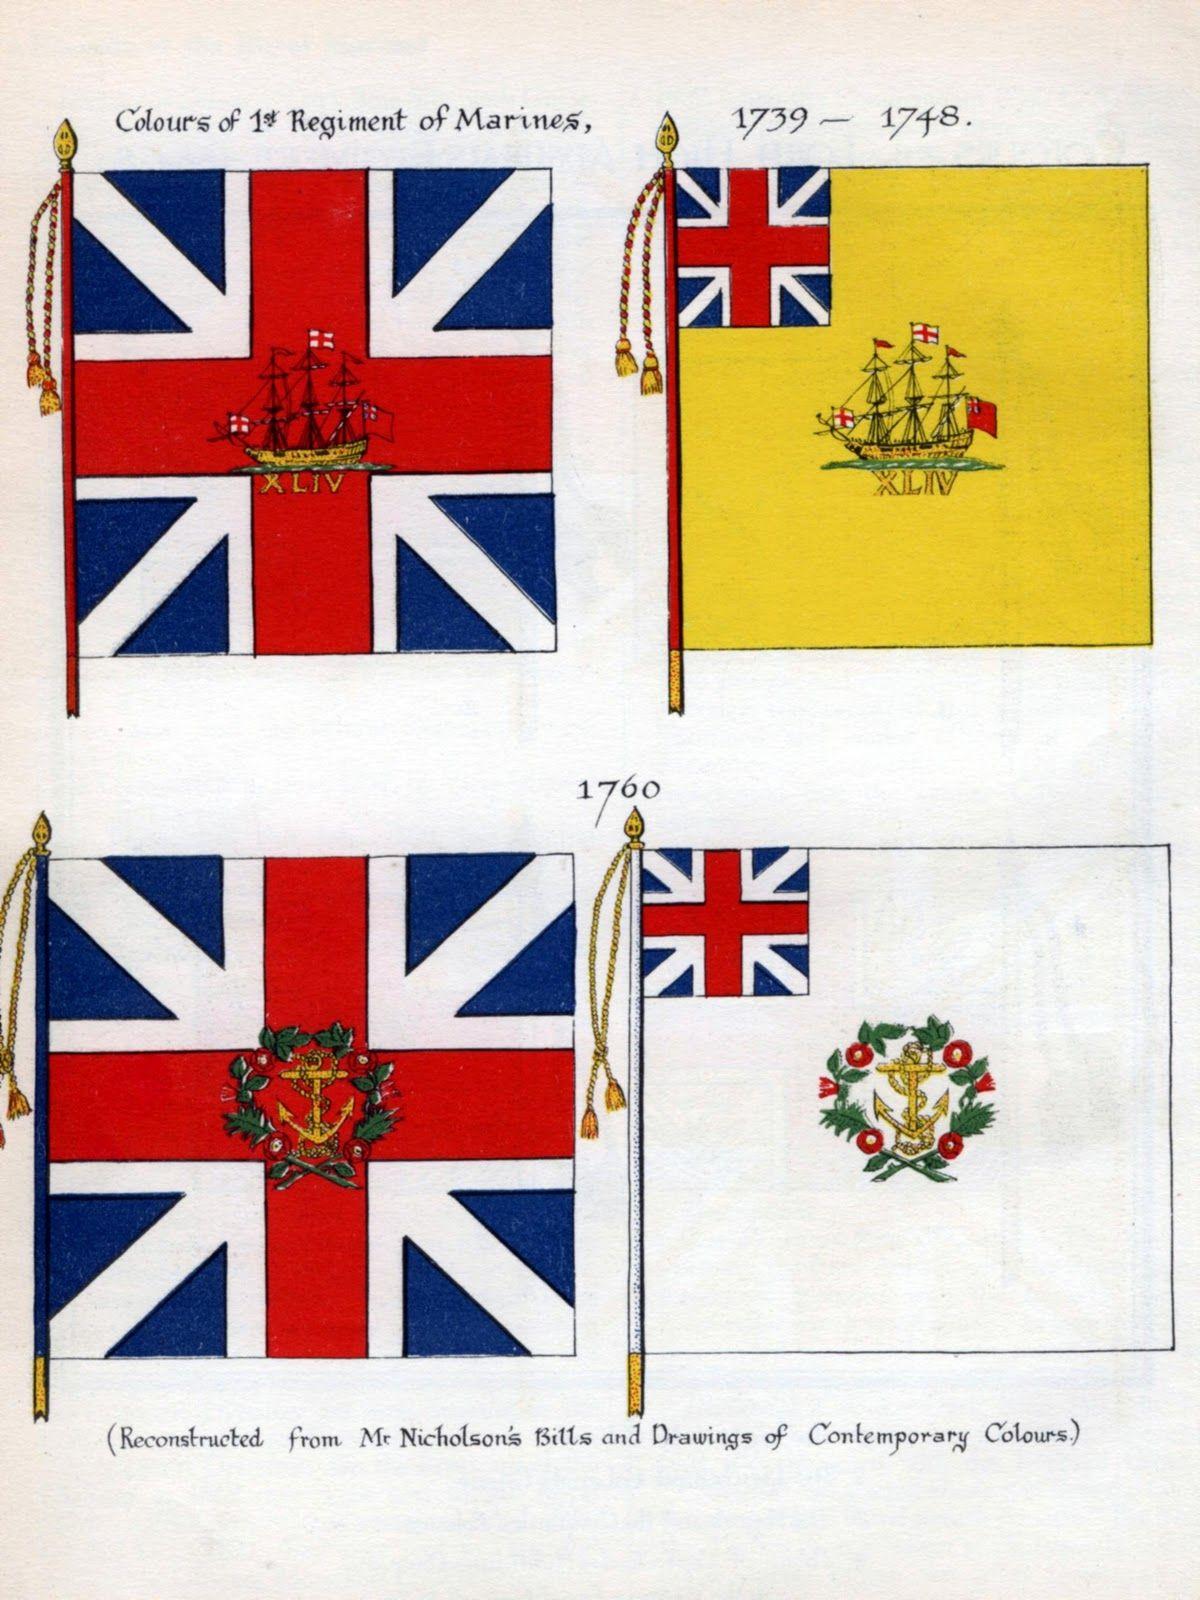 Royal Marines Flag Napoleonic Wars Marine Flag Royal Marines Military Flag